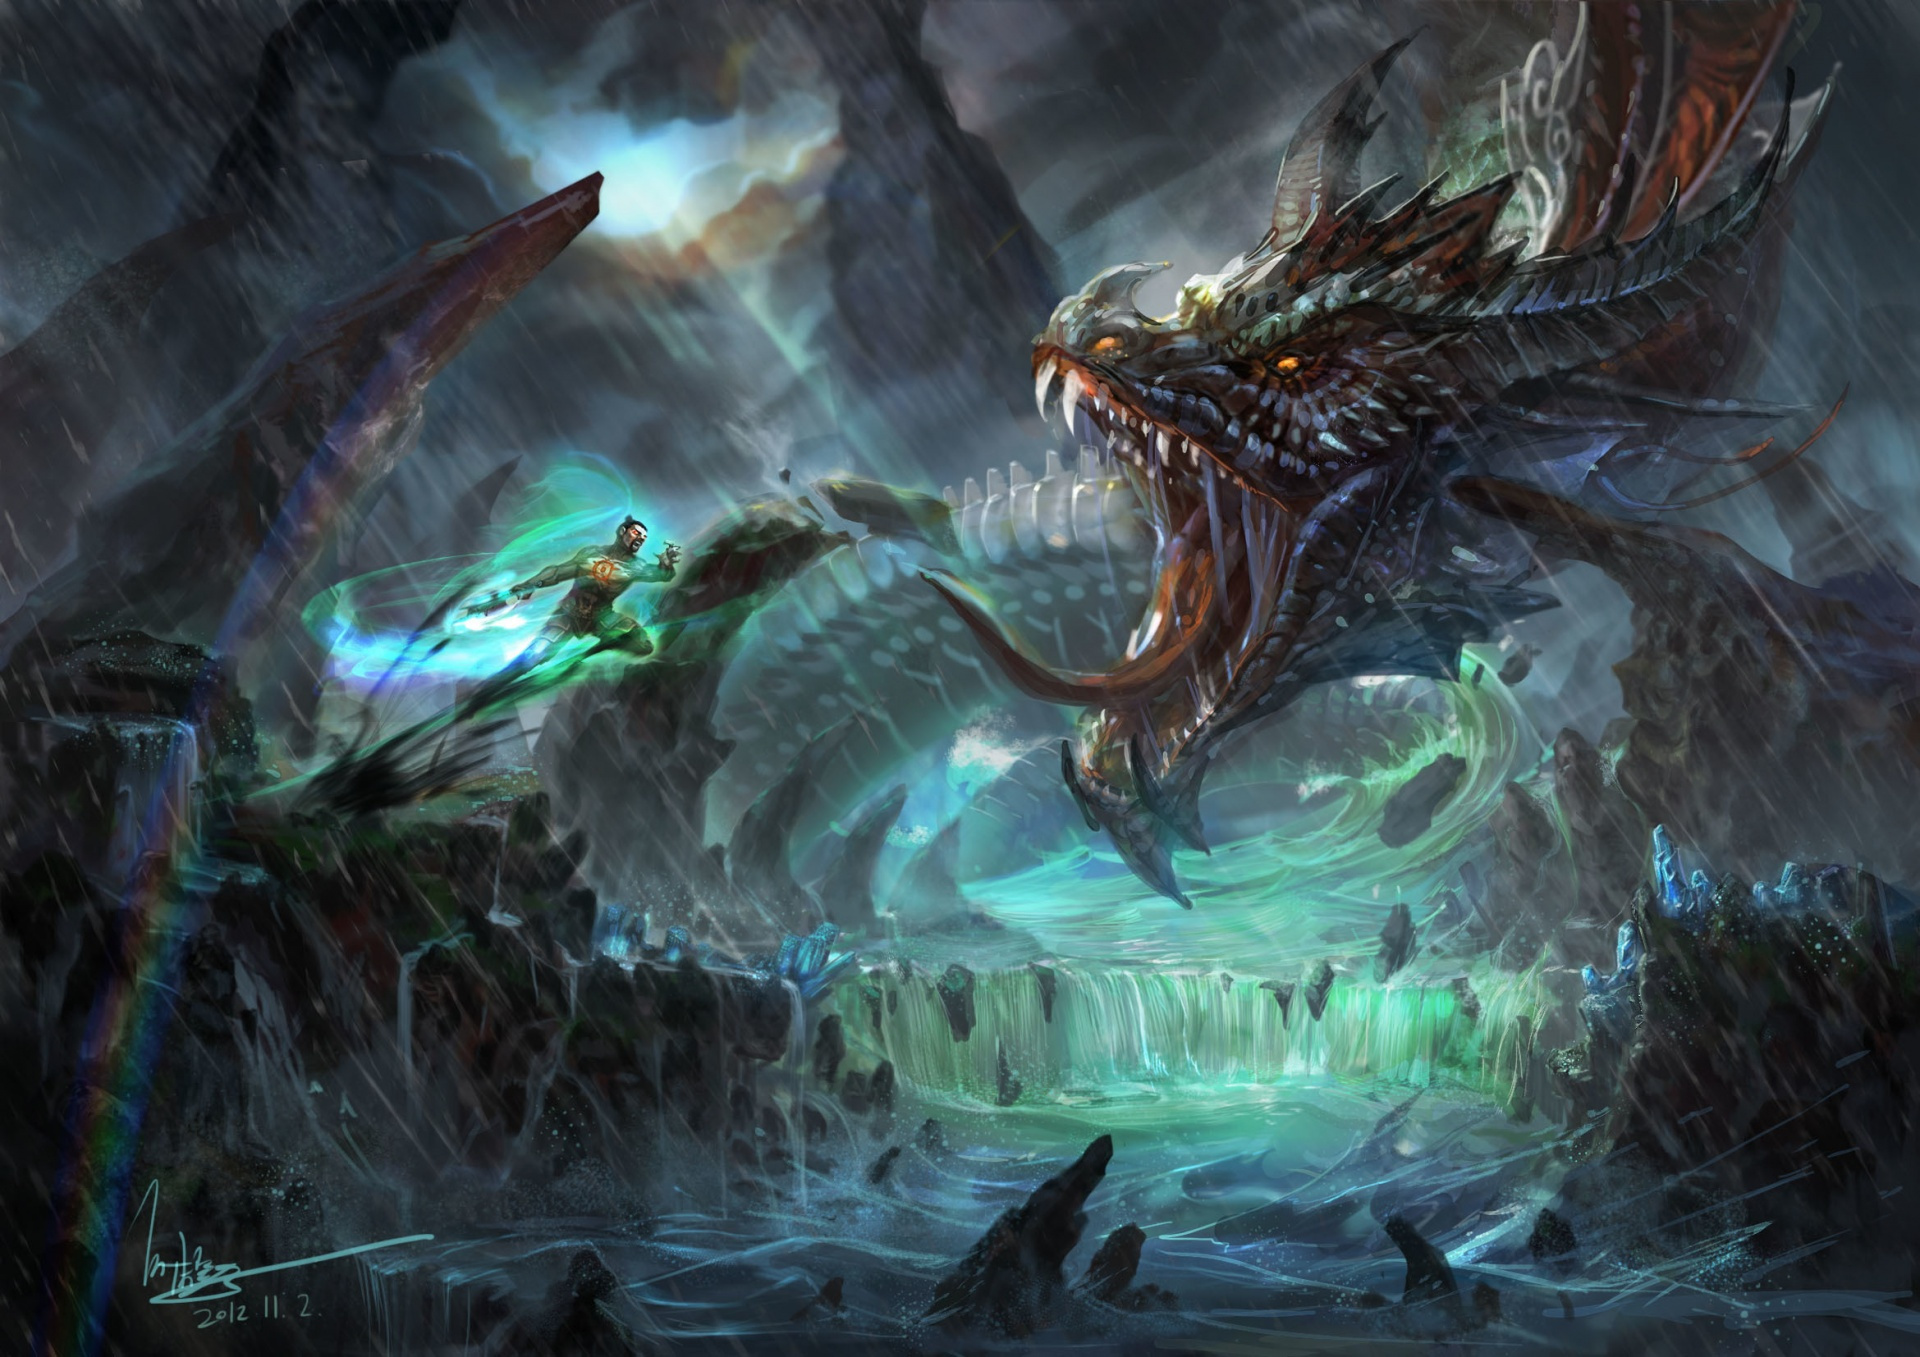 Fantasy Forest 3d Live Wallpaper Battles Monsters Fantasy Dragon Dragons Warrior Warriors